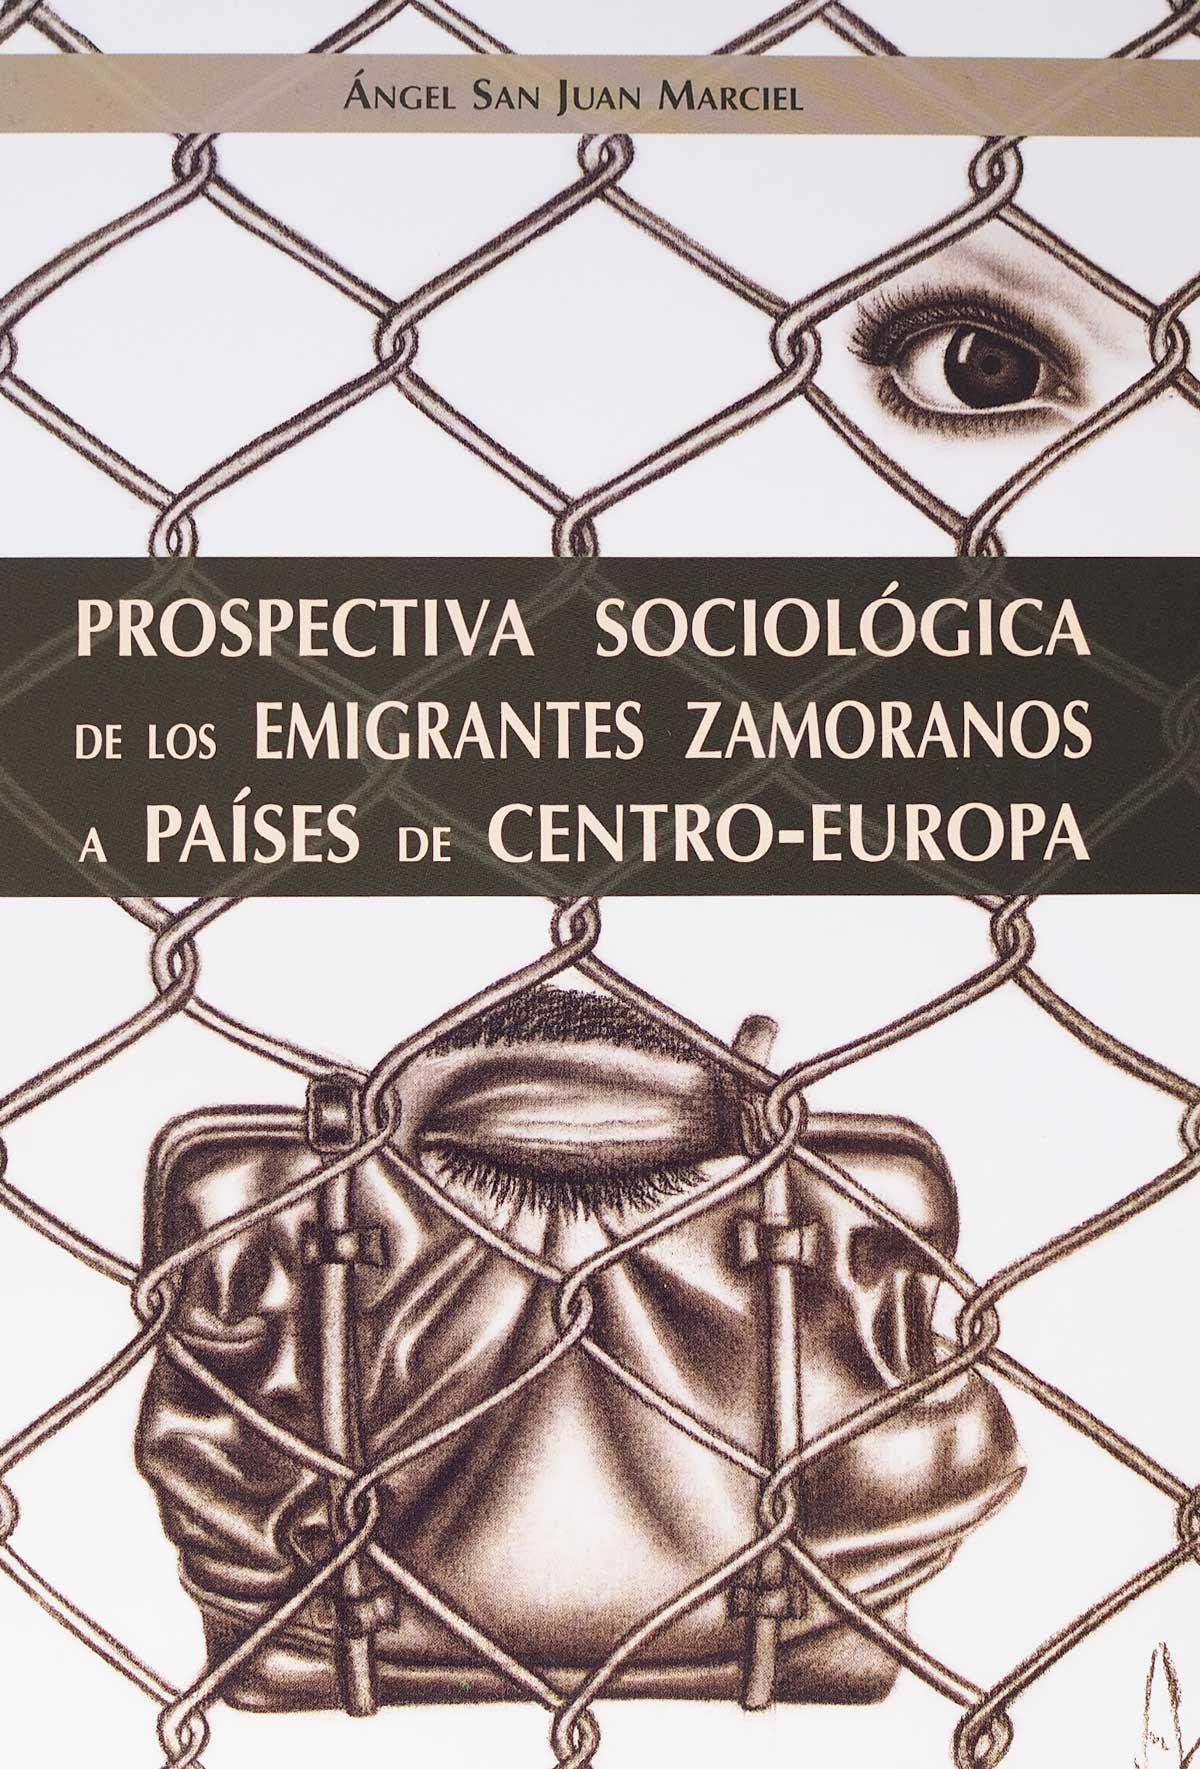 editorial-semuret-sociologia-prospectiva-sociologica-emigrantes-zamoranos-paises-centro-europa